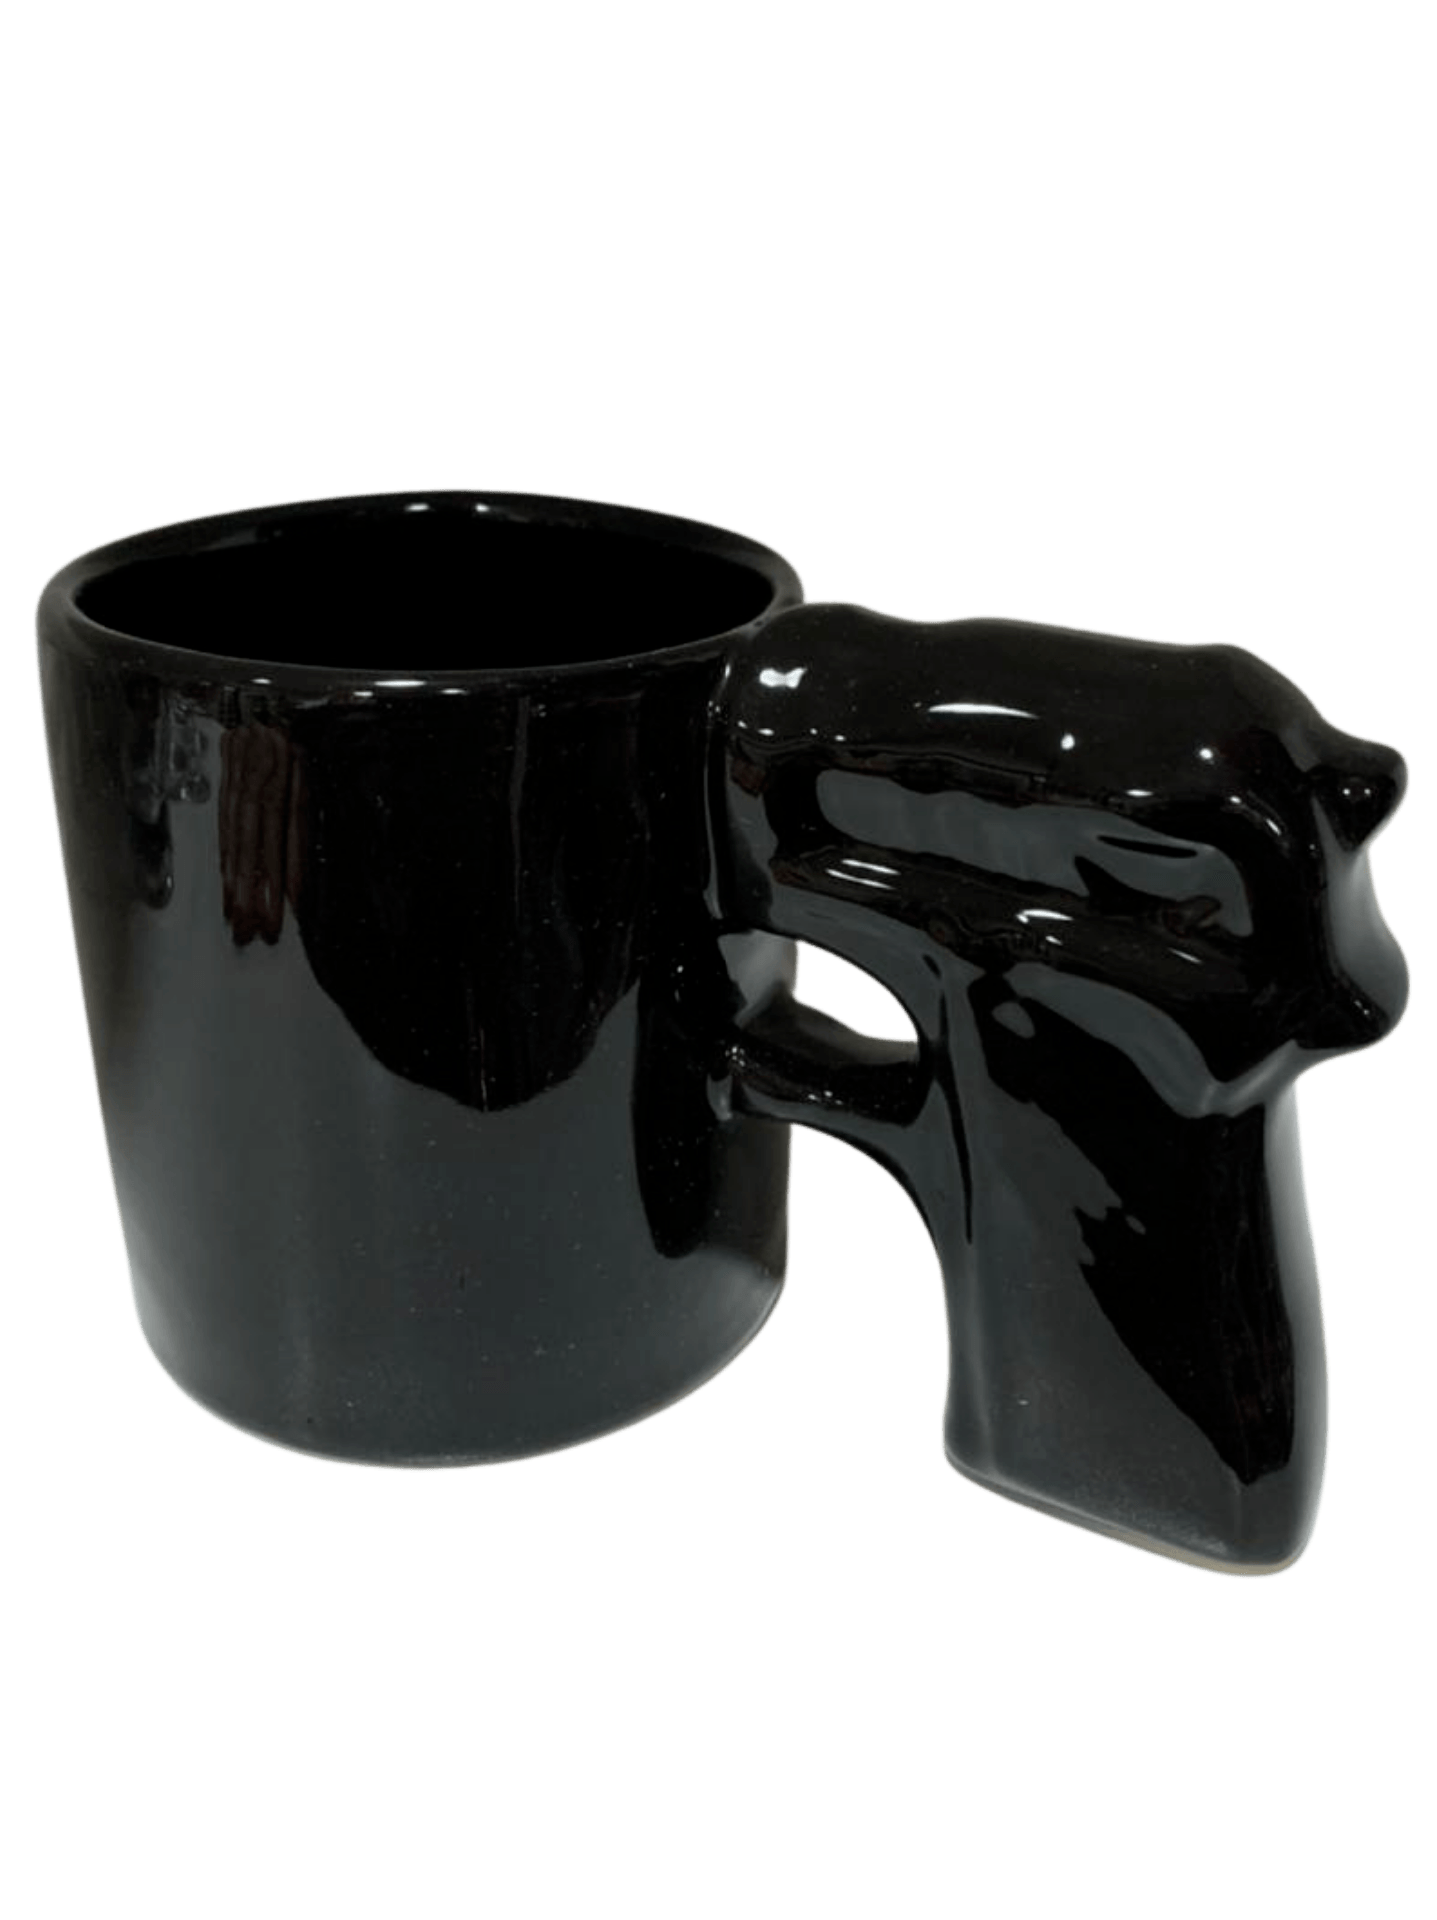 Caneca Cerâmica 3d Arma Pistola Criativa Free Fire Gamer